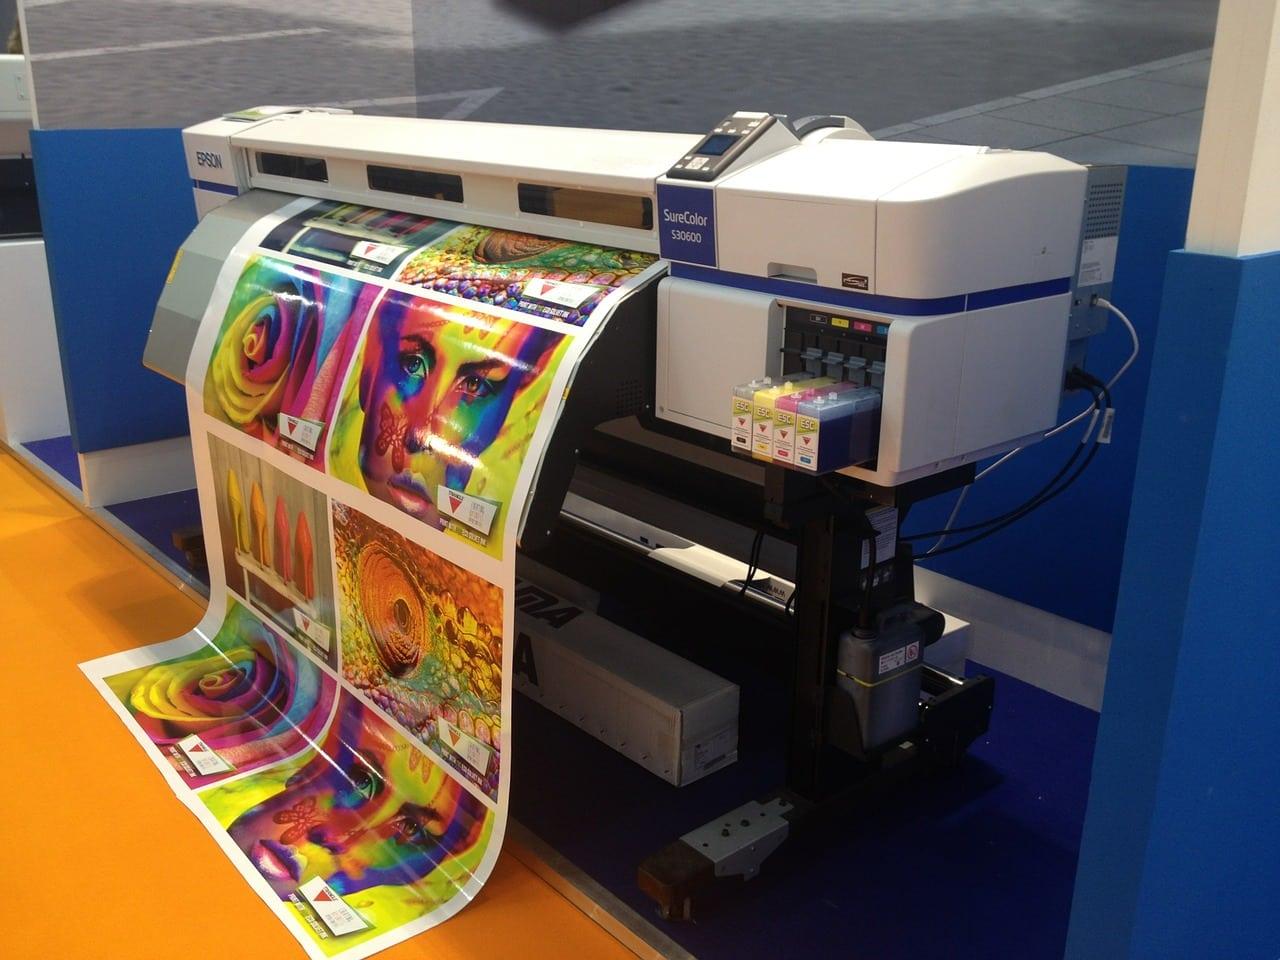 machine 585262 1280 - ระบบการพิมพ์ดิจิตอล (Digital Printing) คืออะไร ?